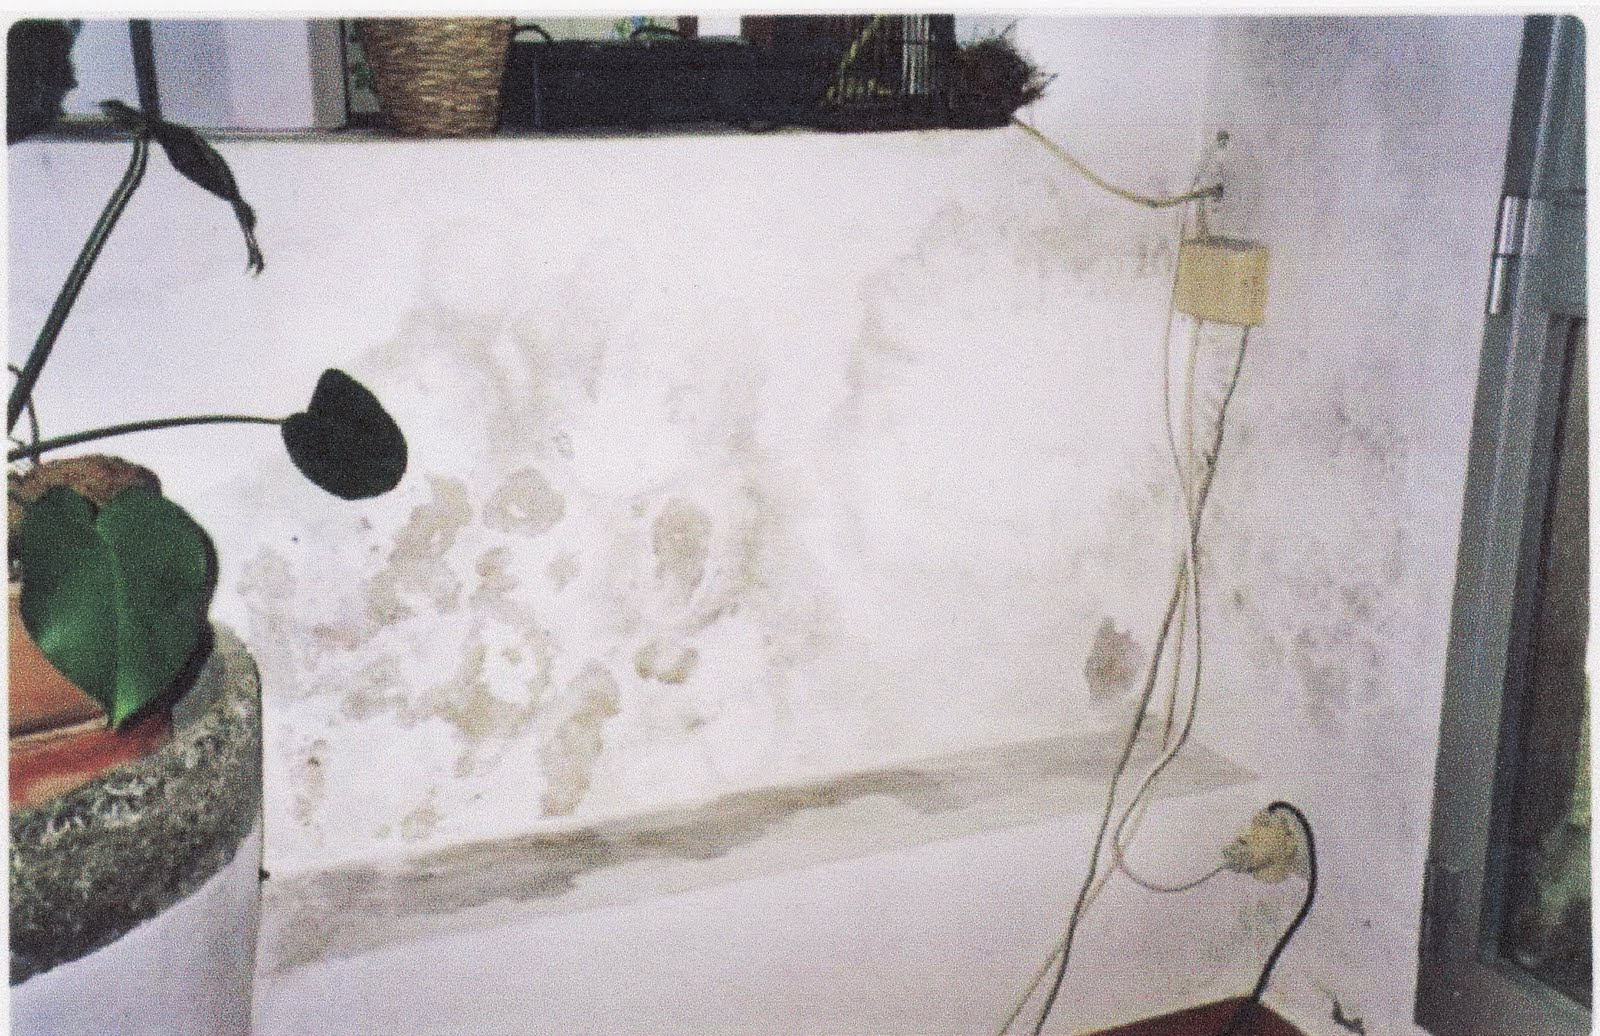 Pintura termoaislante anticondensaci n antimoho para - Leroy merlin pintura interior ...